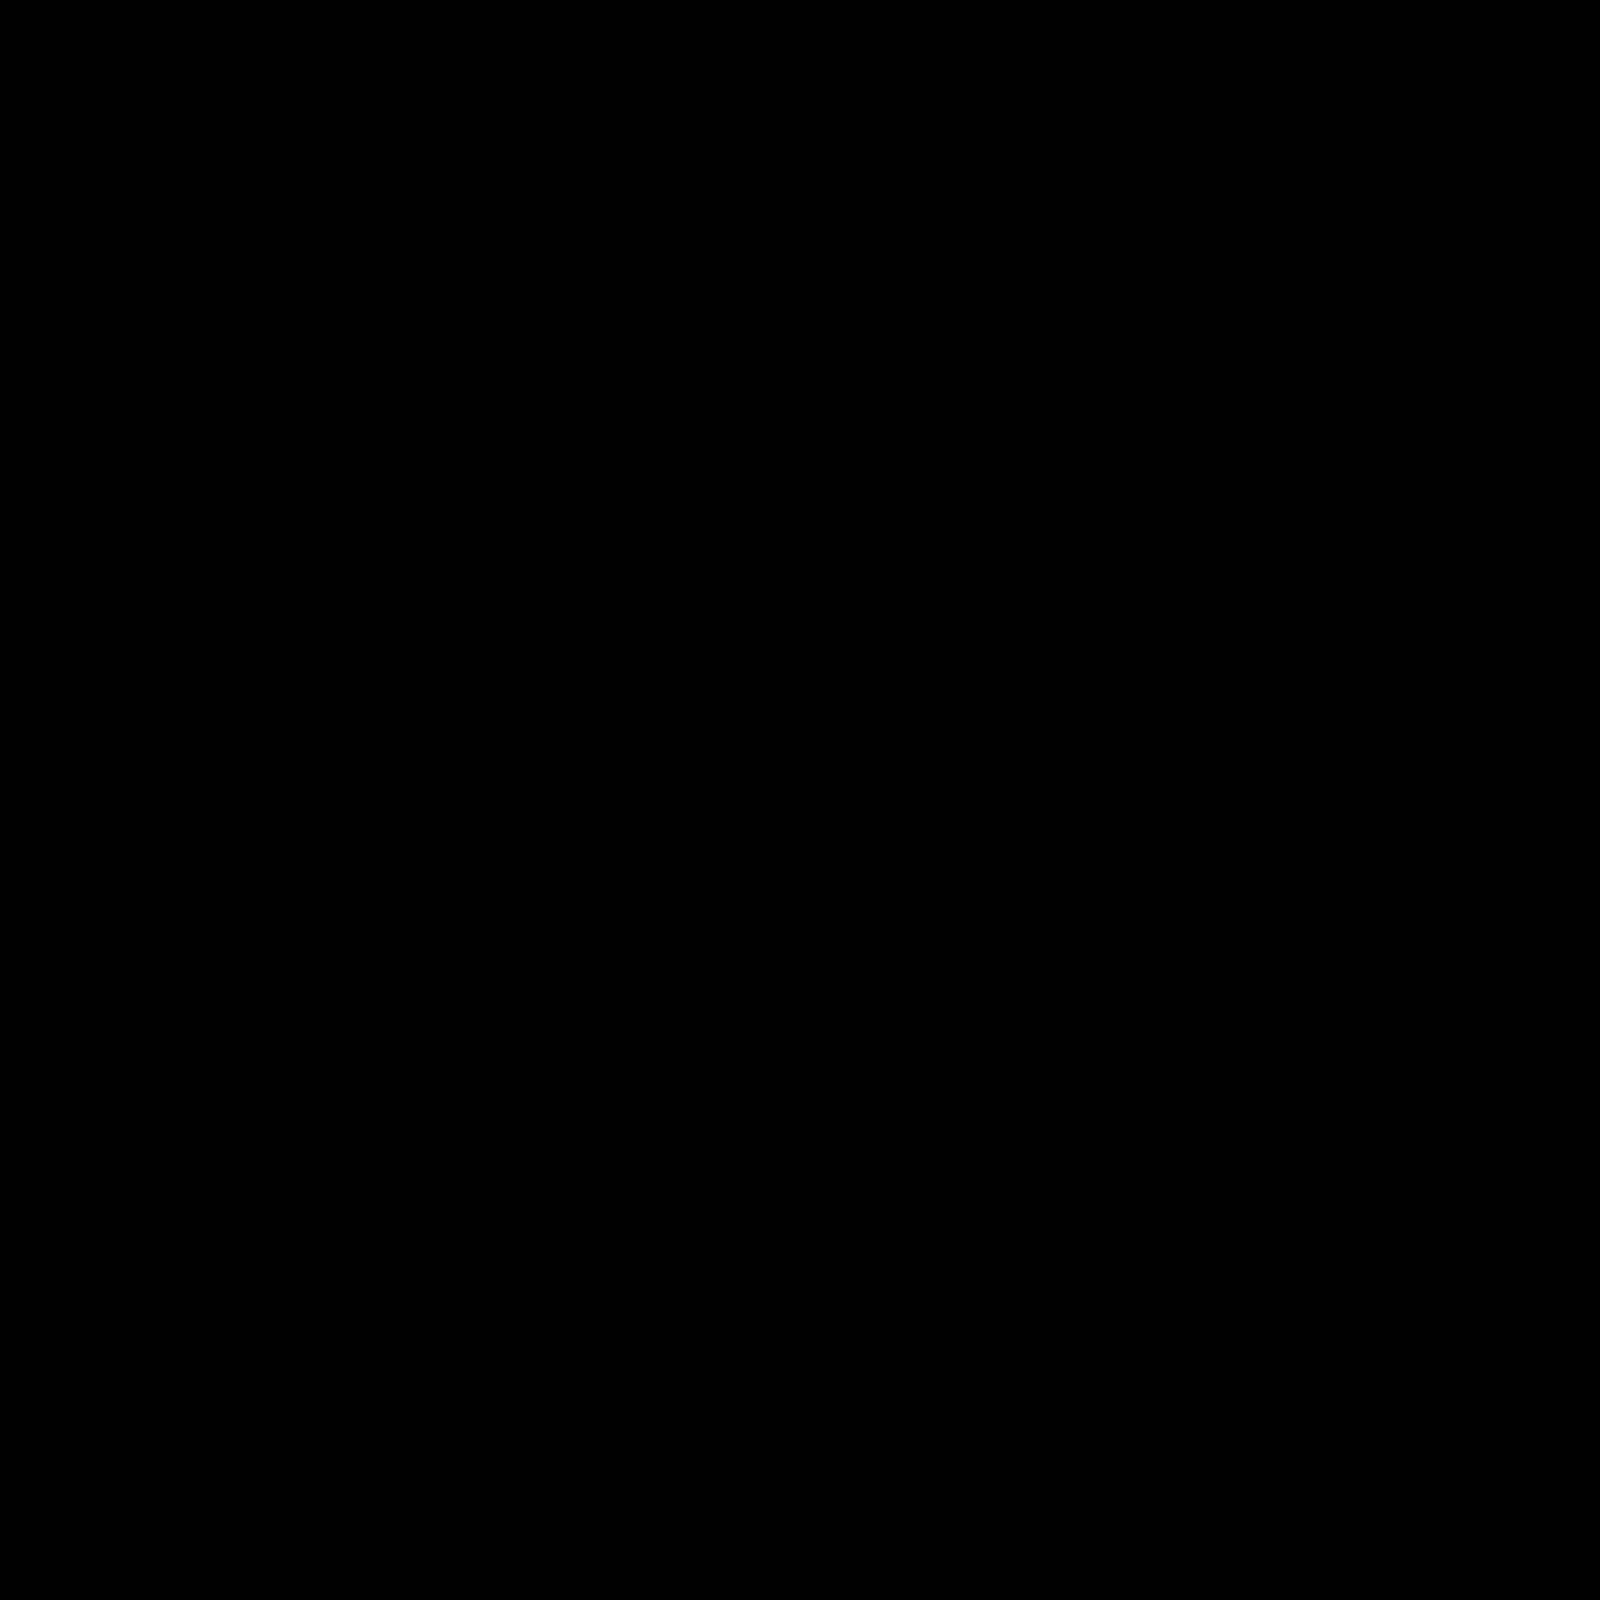 Icon free download png. Hanukkah clipart hanukkah candle